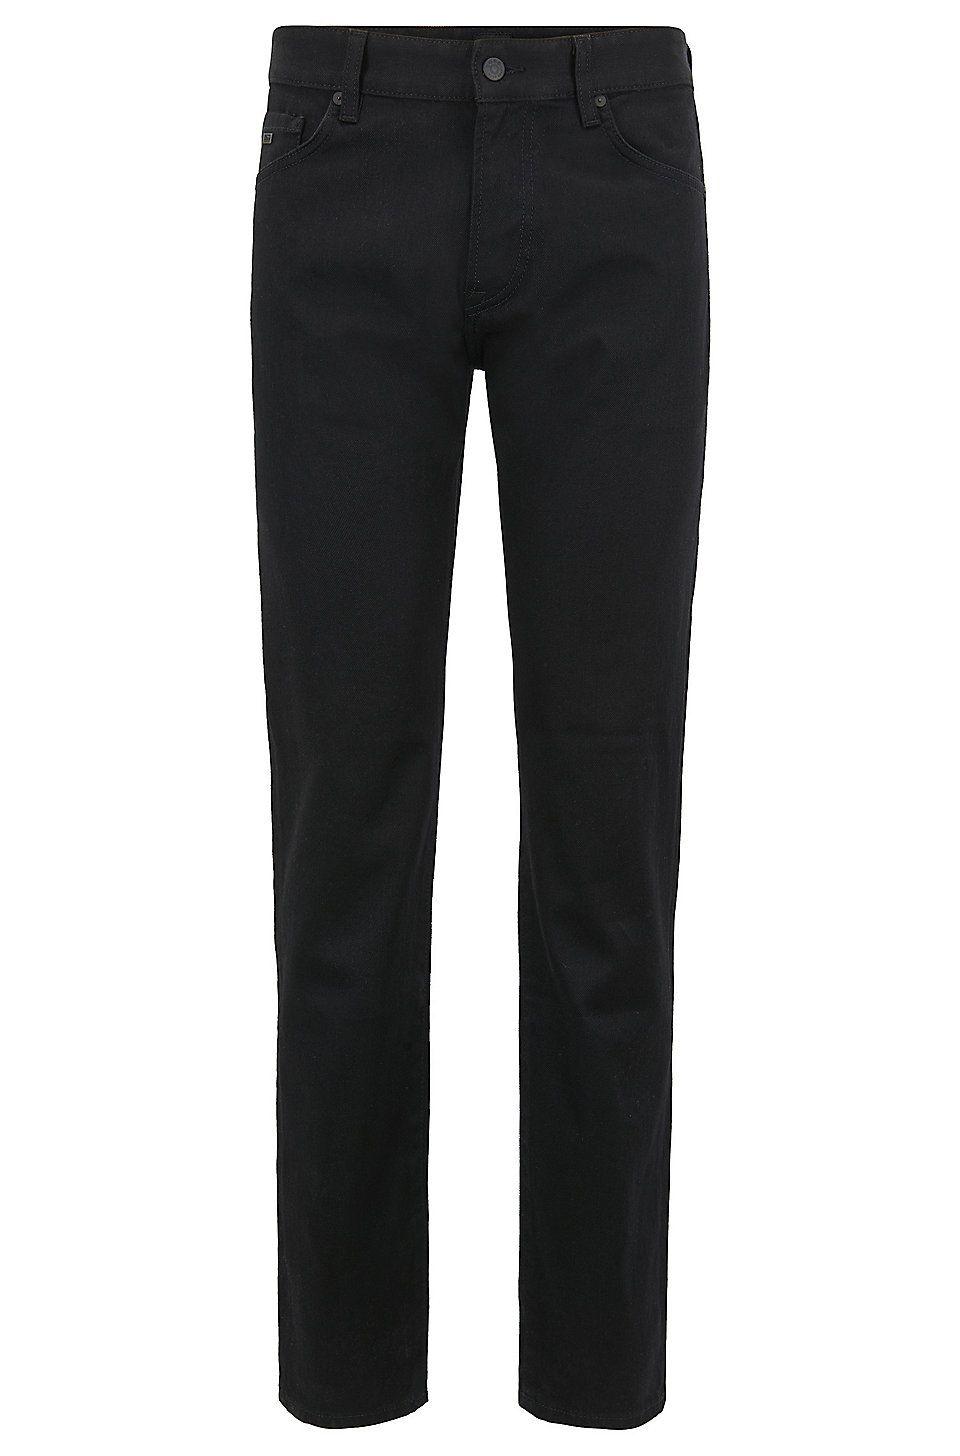 Boss Regular Fit Jeans In Black Black Stretch Denim Ripped Jeans Men Men Jeans Pants Mens Fashion Jeans [ 1456 x 960 Pixel ]